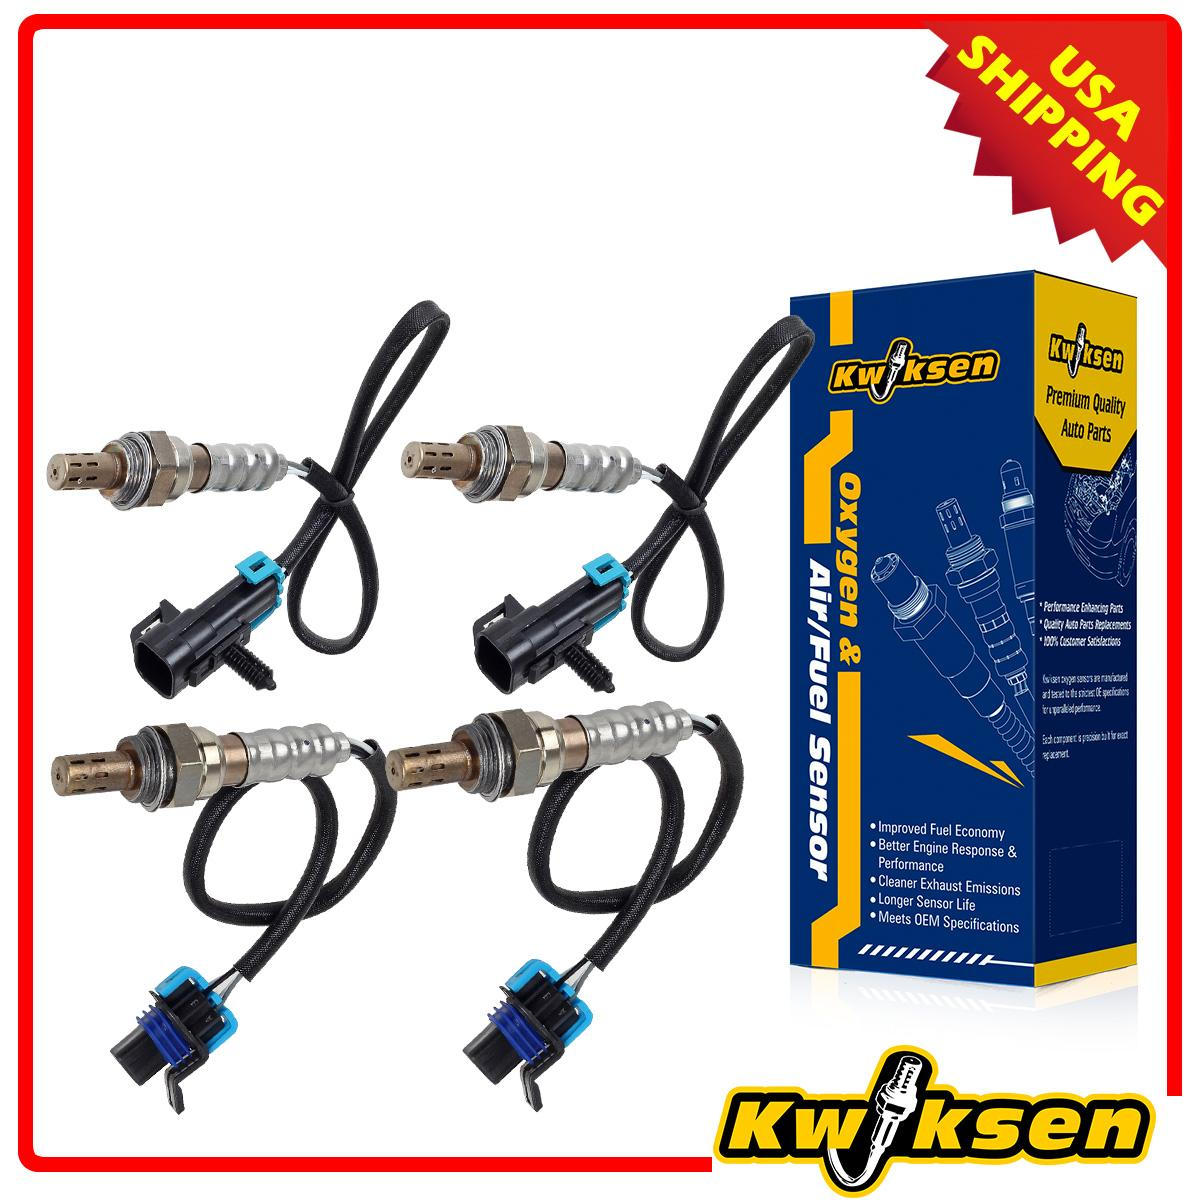 Oxygen Sensor UpstreamampDownstream Fit - 06 silverado o2 sensor wiring diagram